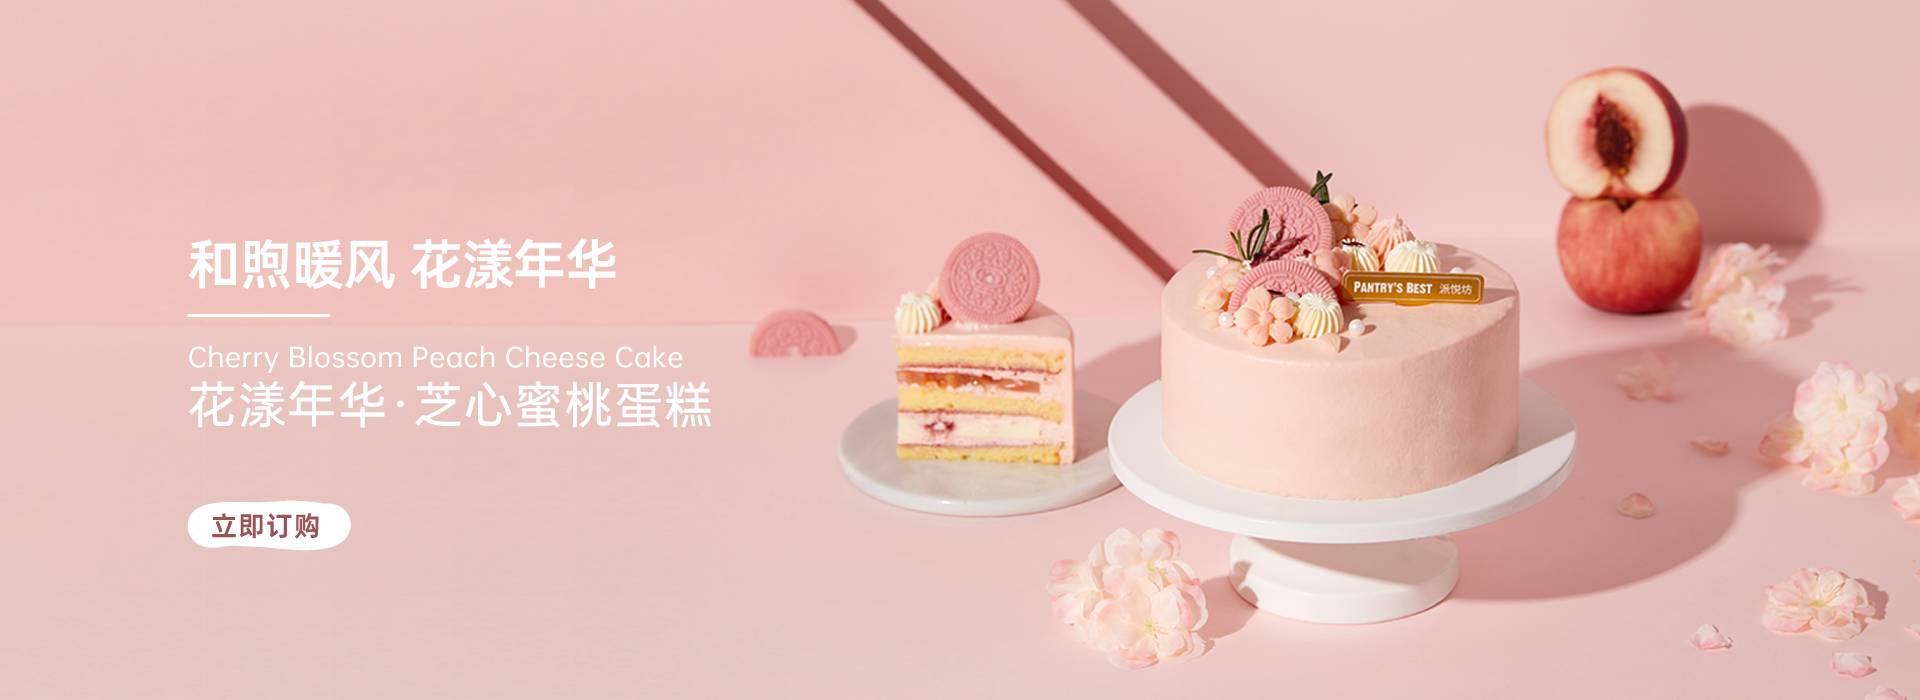 Cherry Blossom Peach Cheese Cake